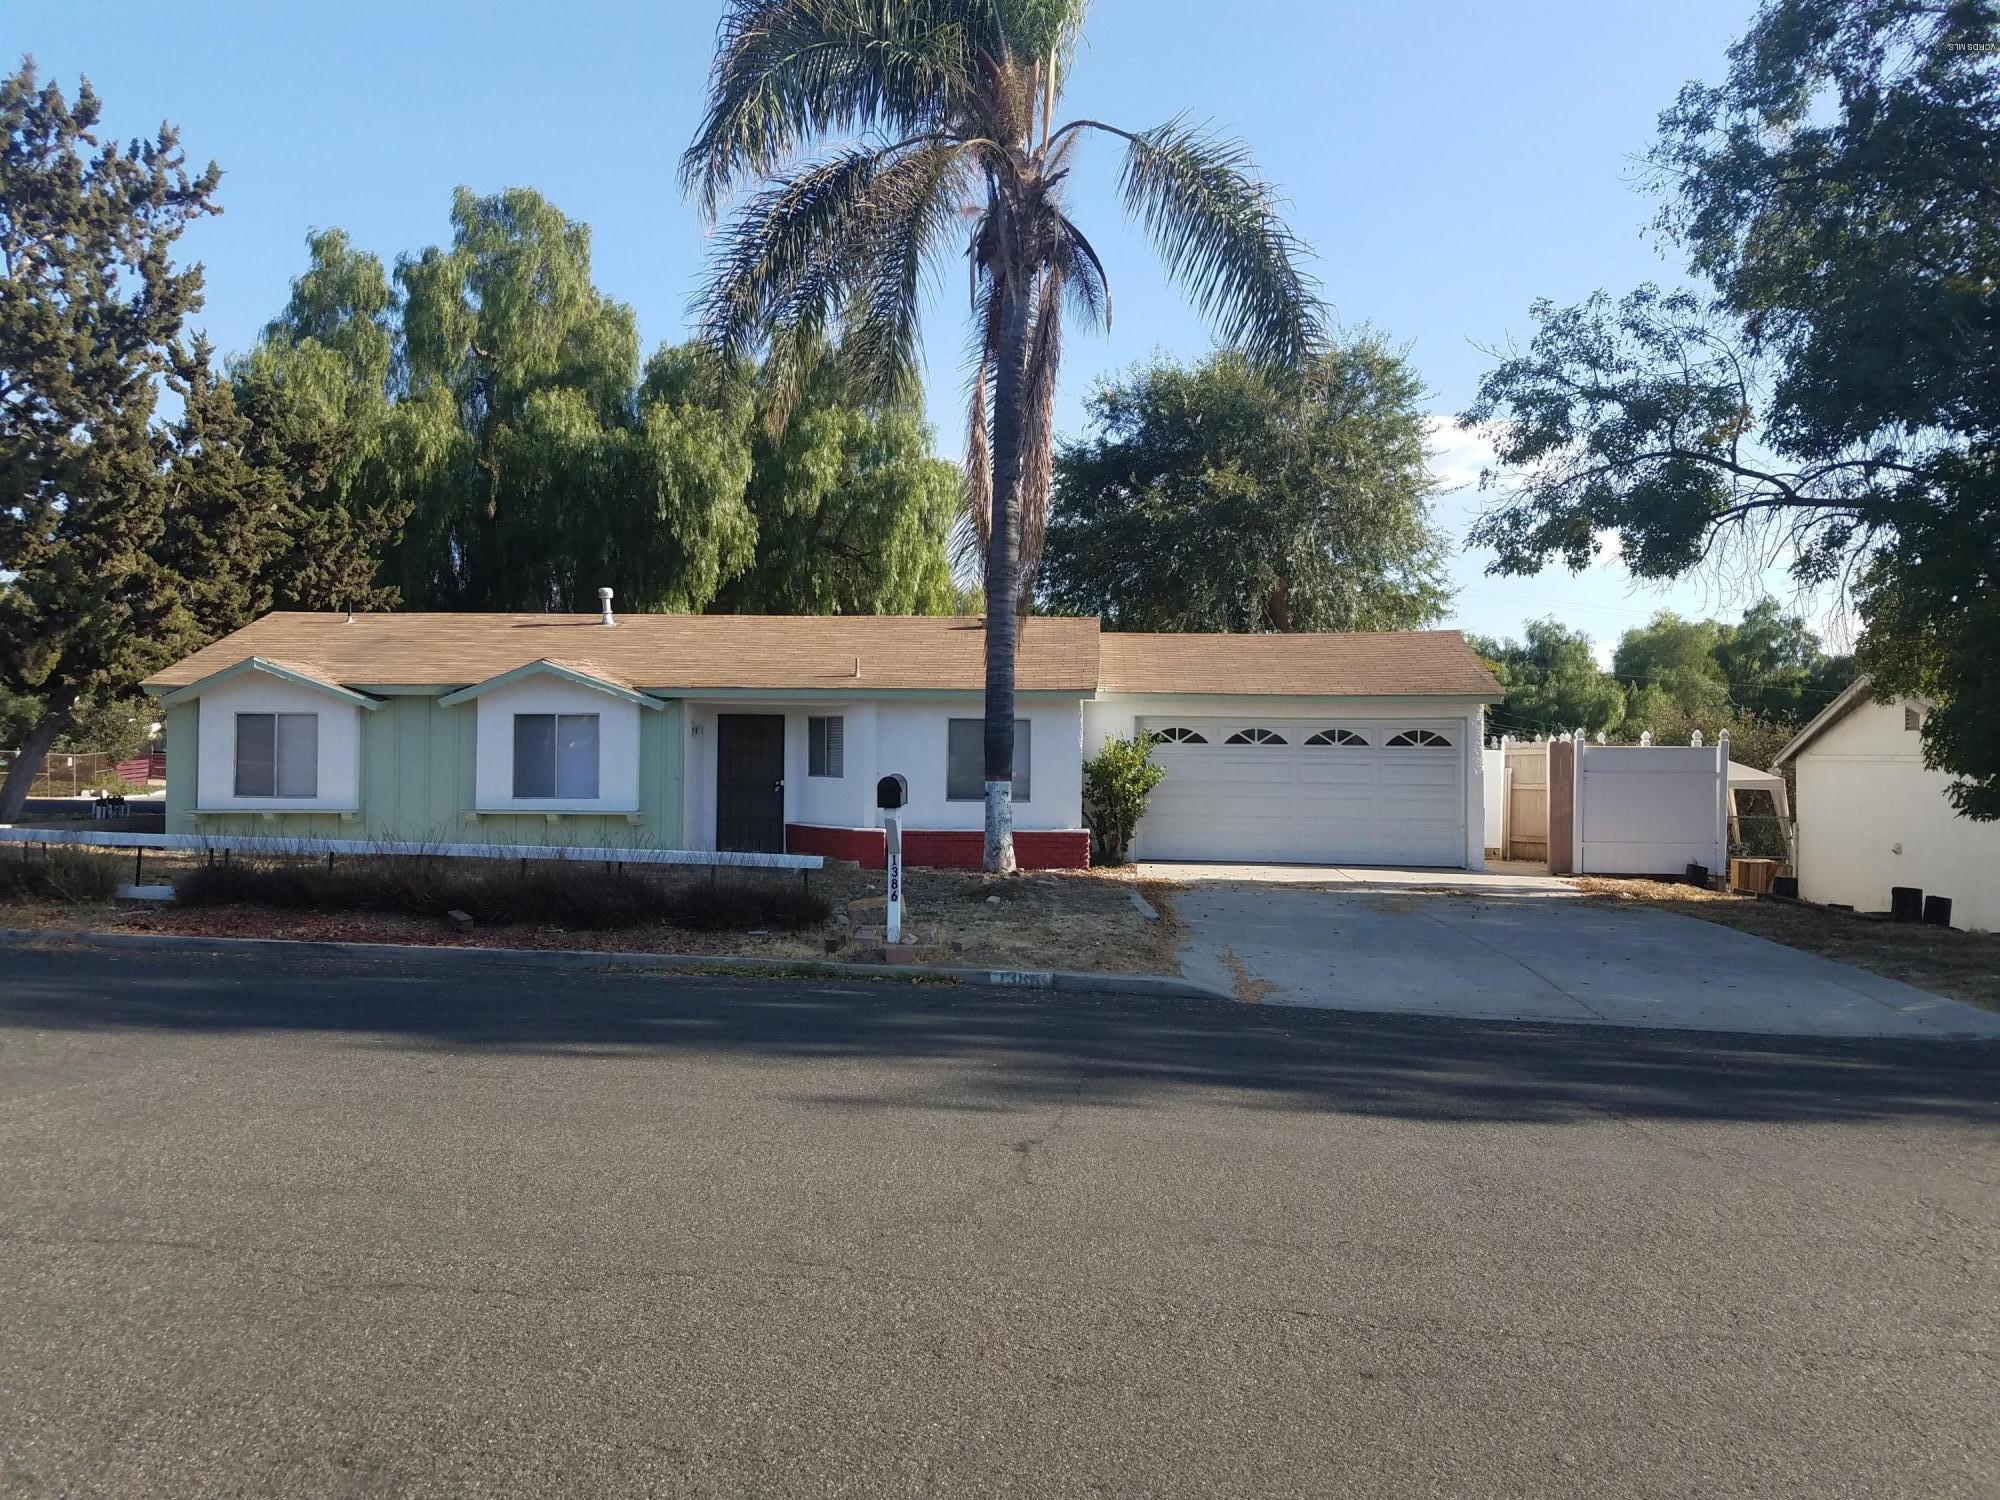 1386 Calle Tulipan, Thousand Oaks, CA 91360